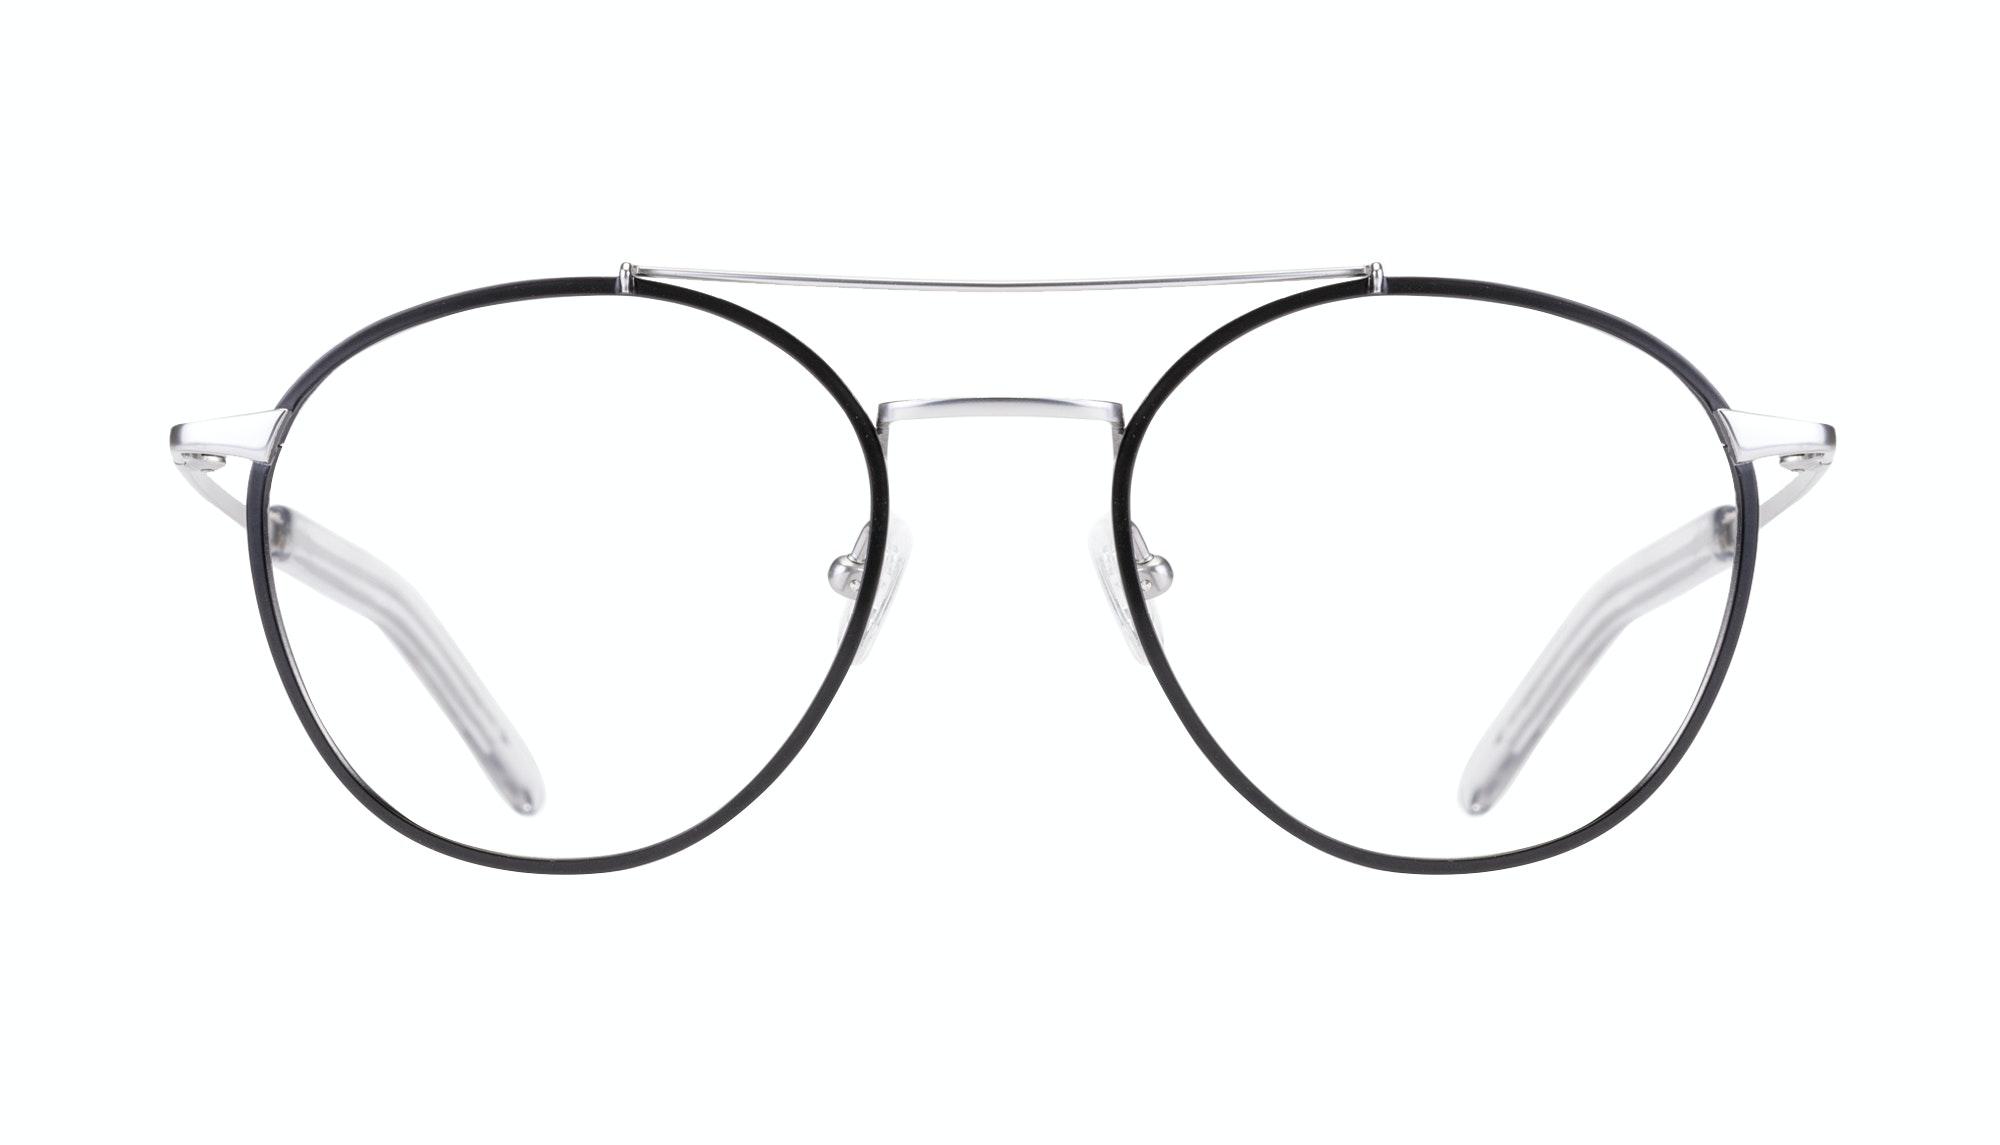 Affordable Fashion Glasses Aviator Eyeglasses Men Gravity Black Silver Front